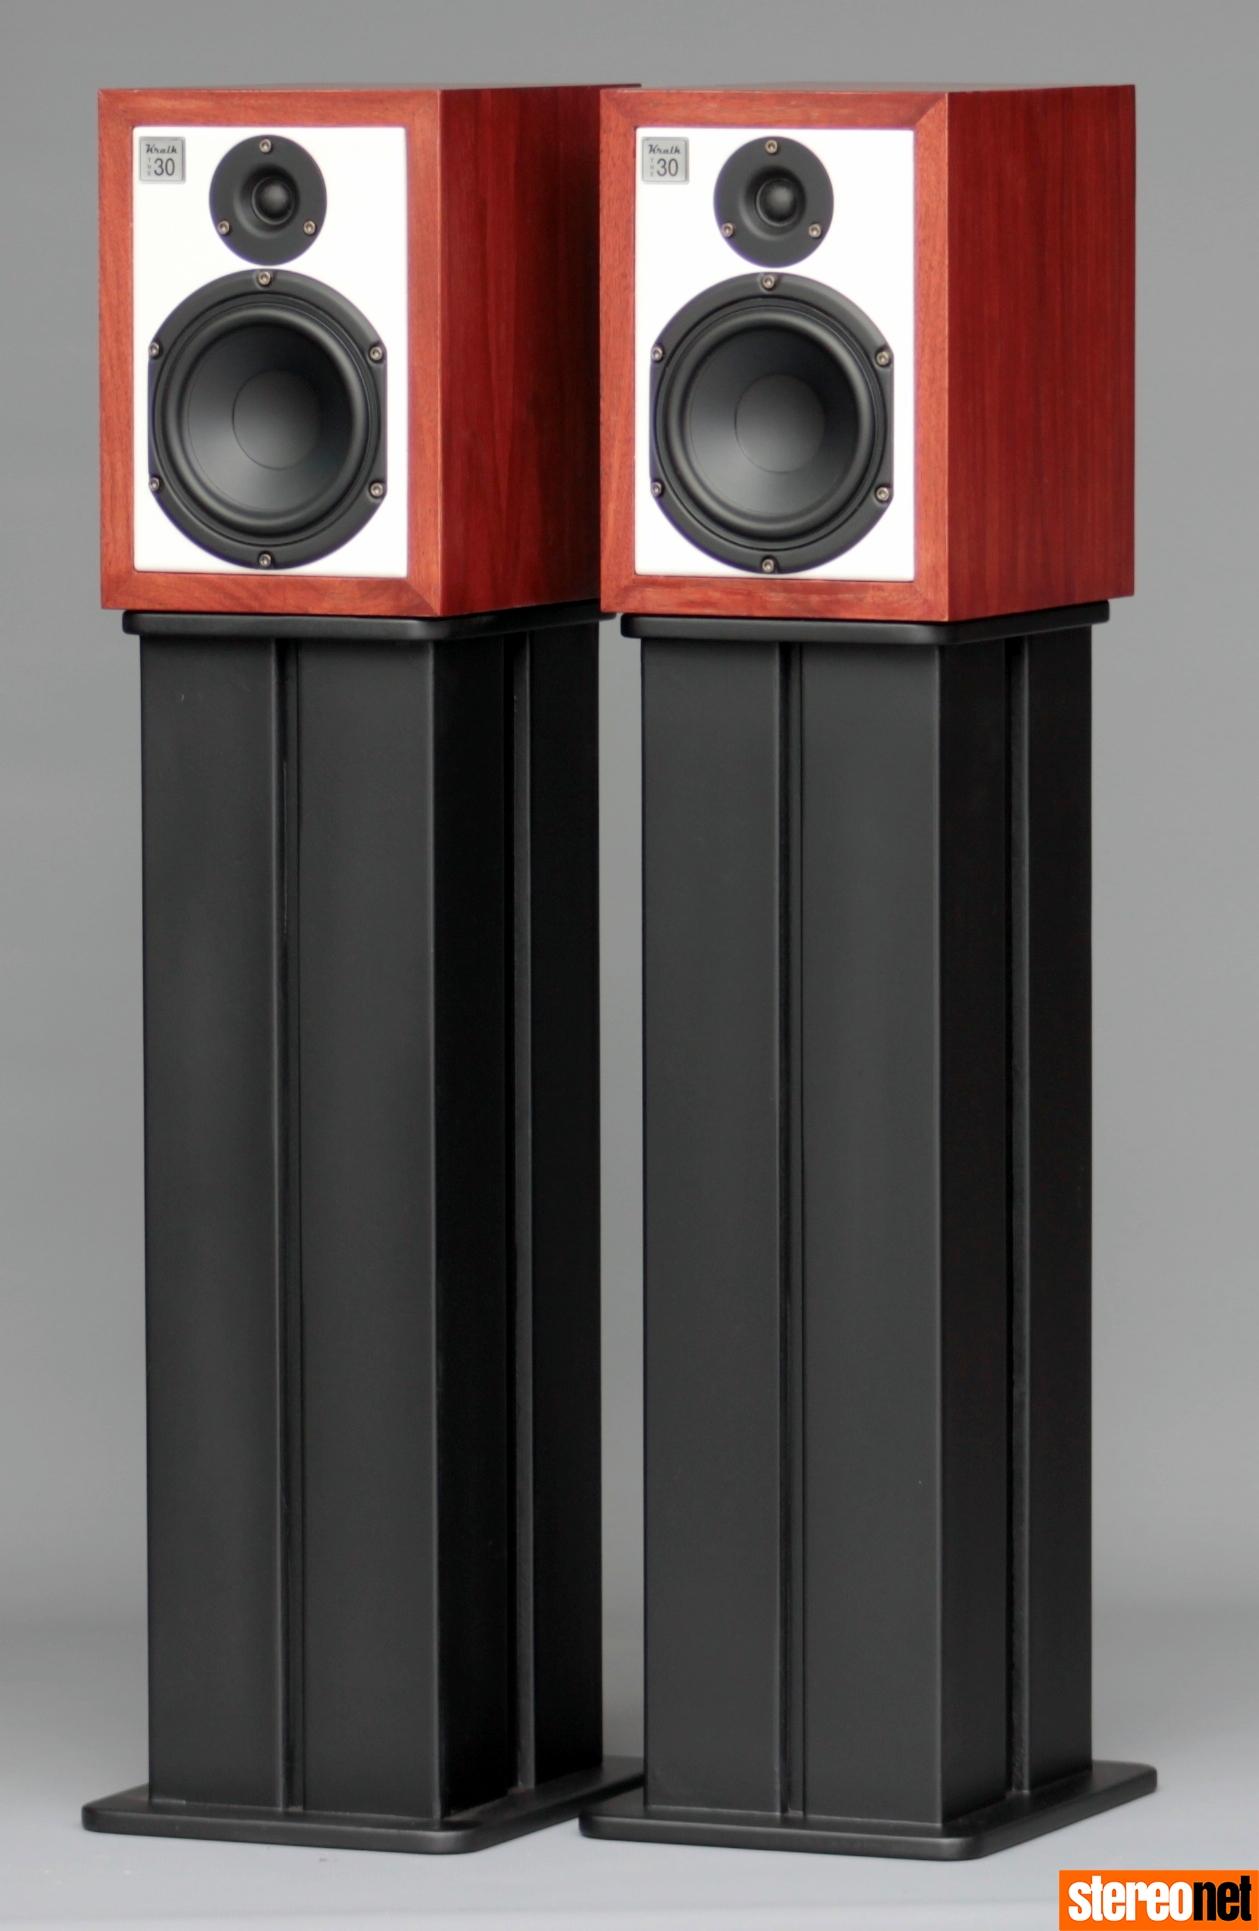 Kralk Audio 30